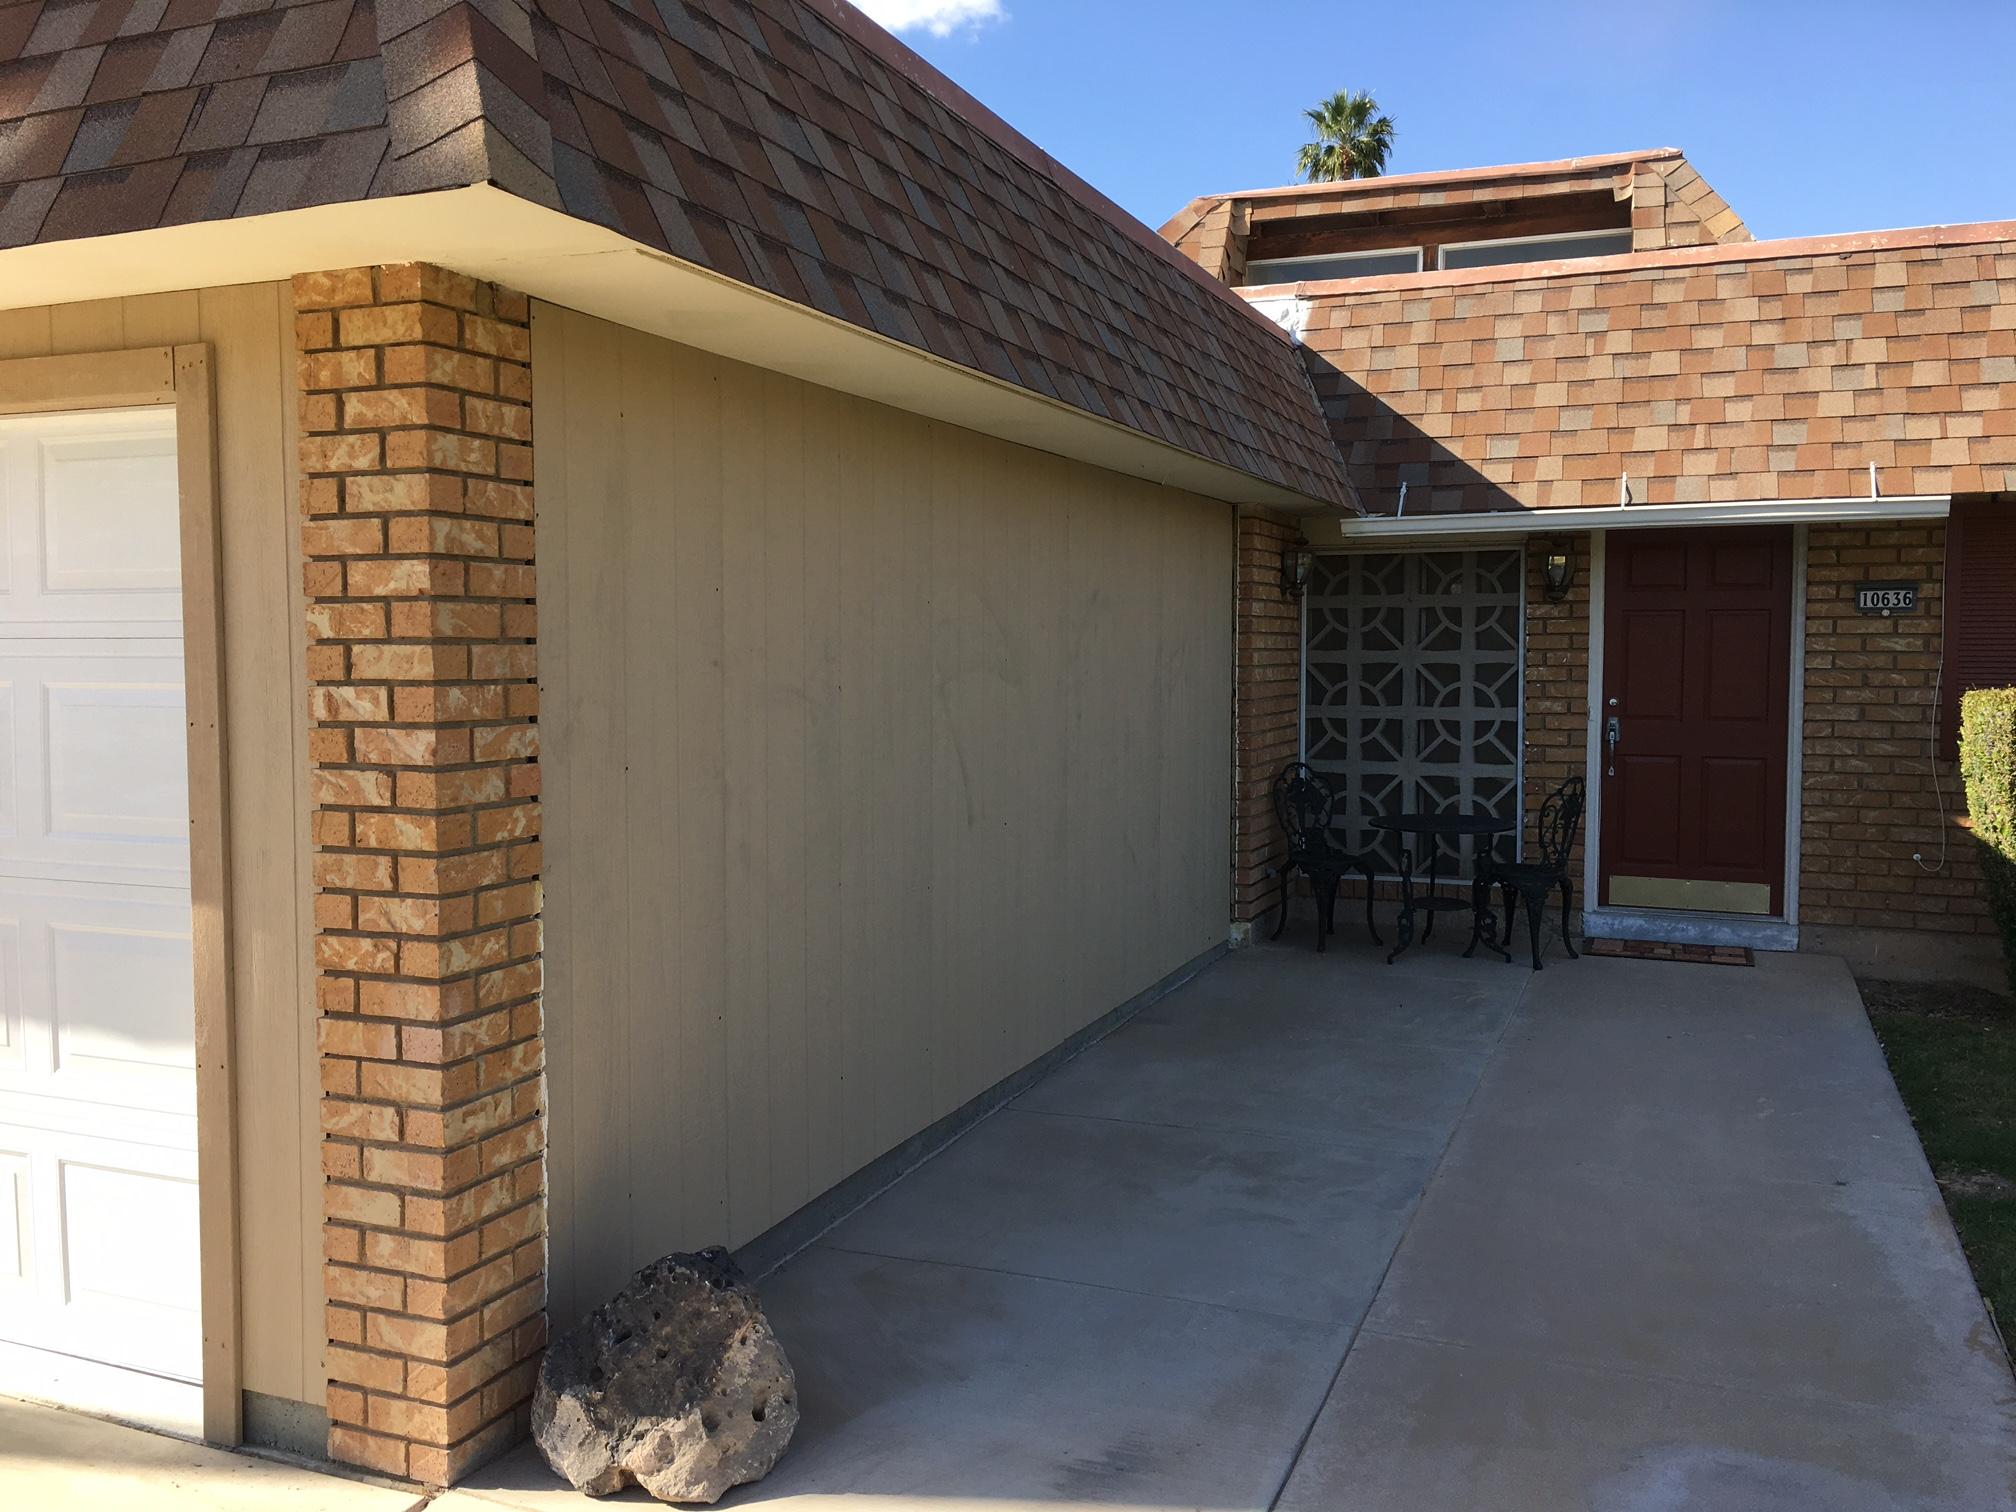 Carport-to-garage conversion Phoenix: before & after photos